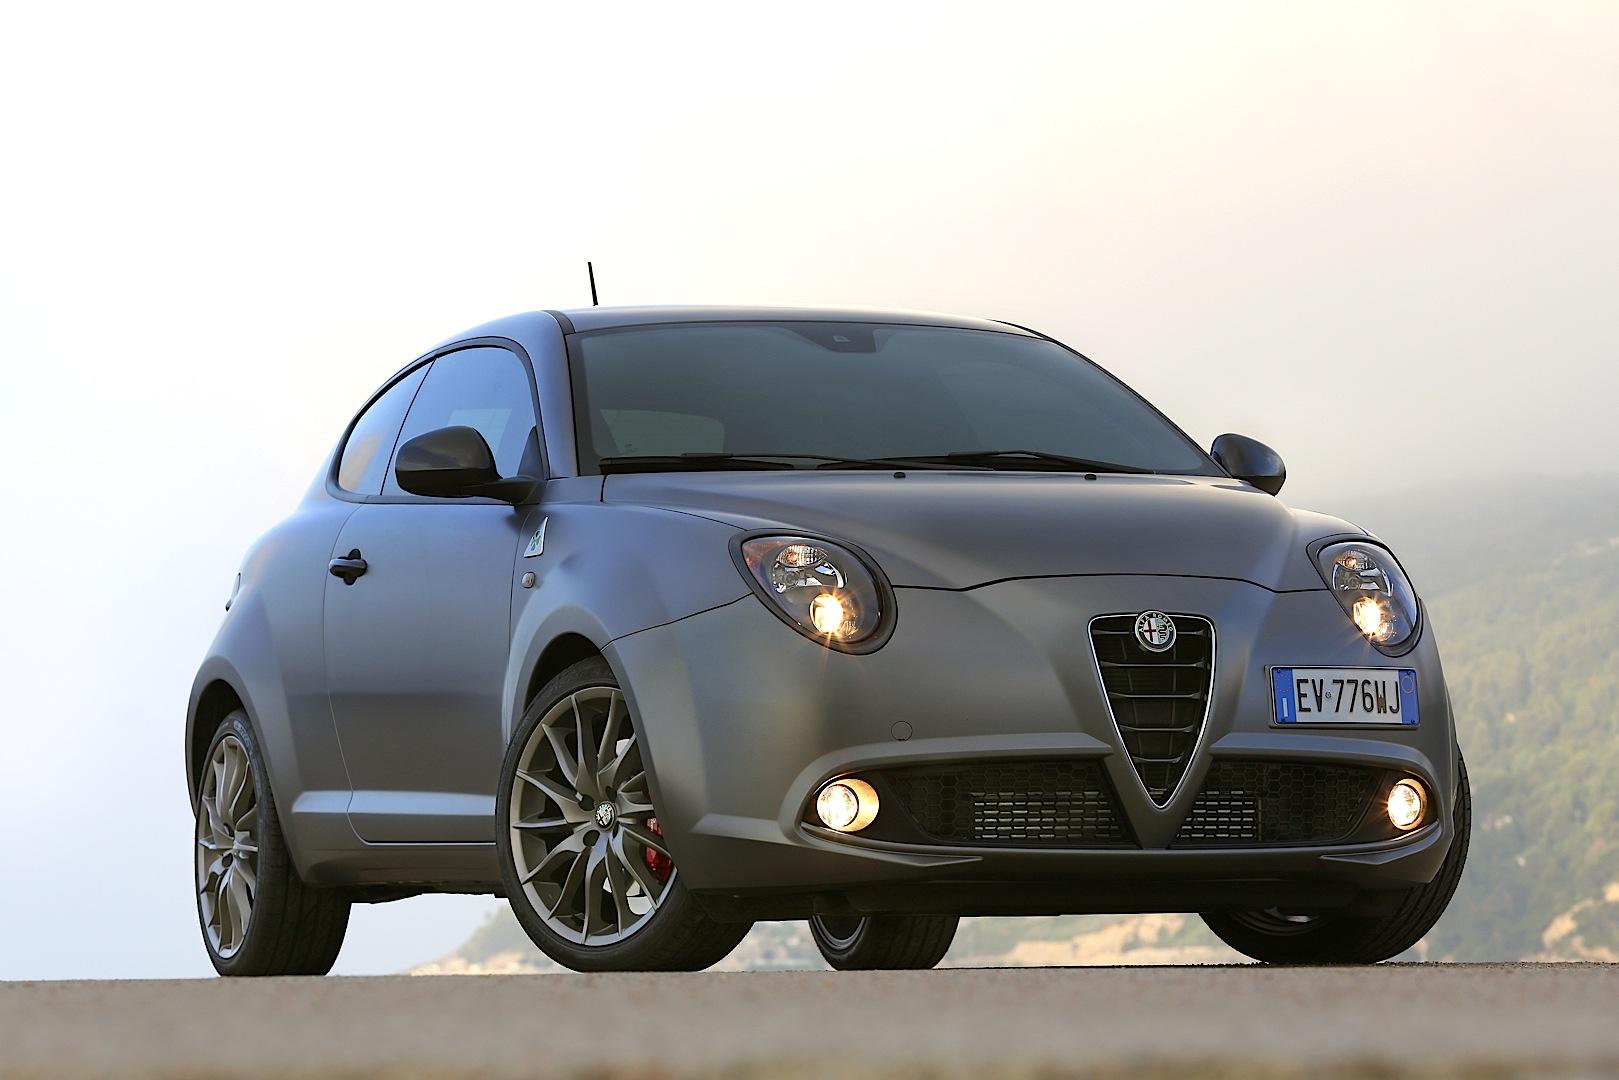 Alfa romeo 159 exhaust tip